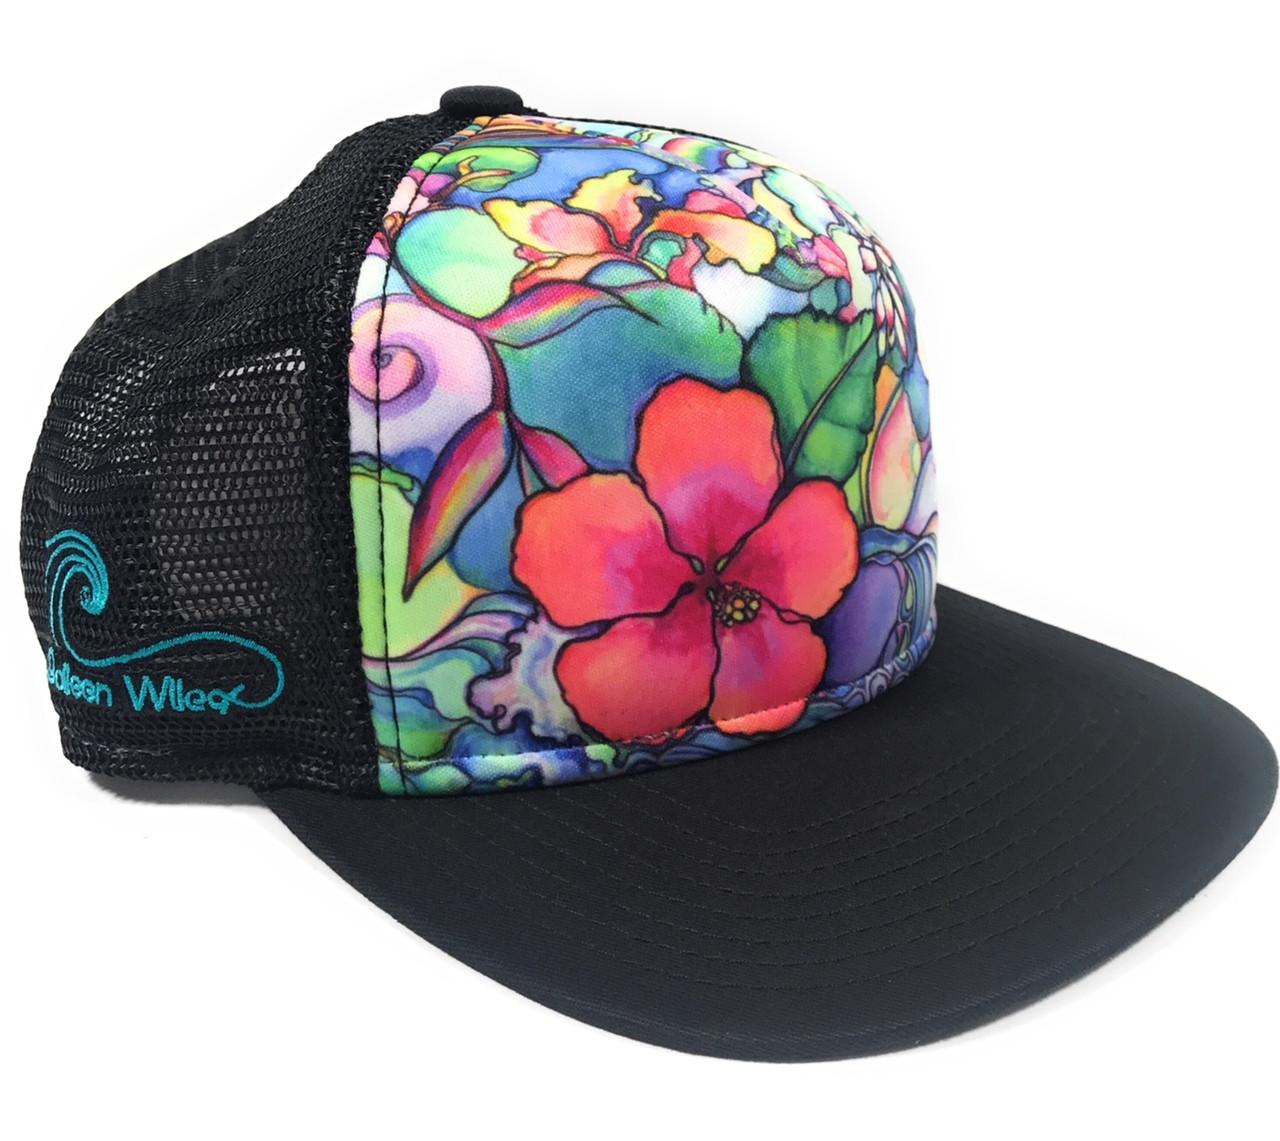 Aloha Trucker Hats Island Style by Colleen Wilcox - Black  89b2aa1bc3f